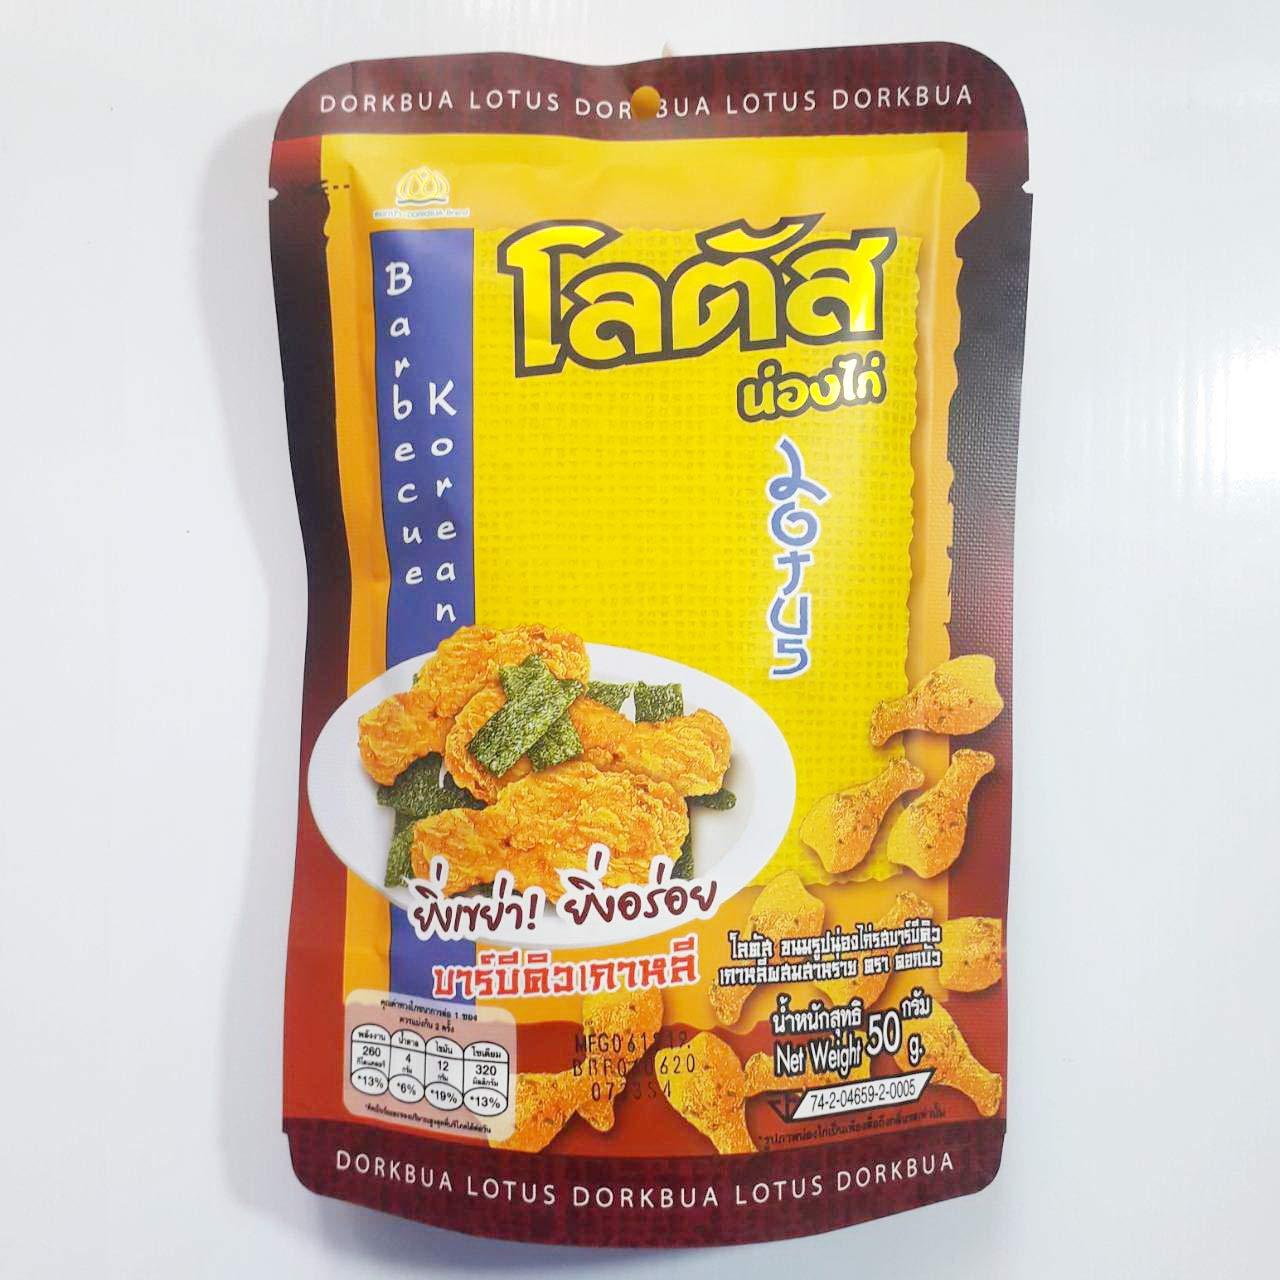 Lotus Biscuits ,Snacks Chicken Legs Korean BBQ Thai Style Snack Crispy and tasty 50 g.